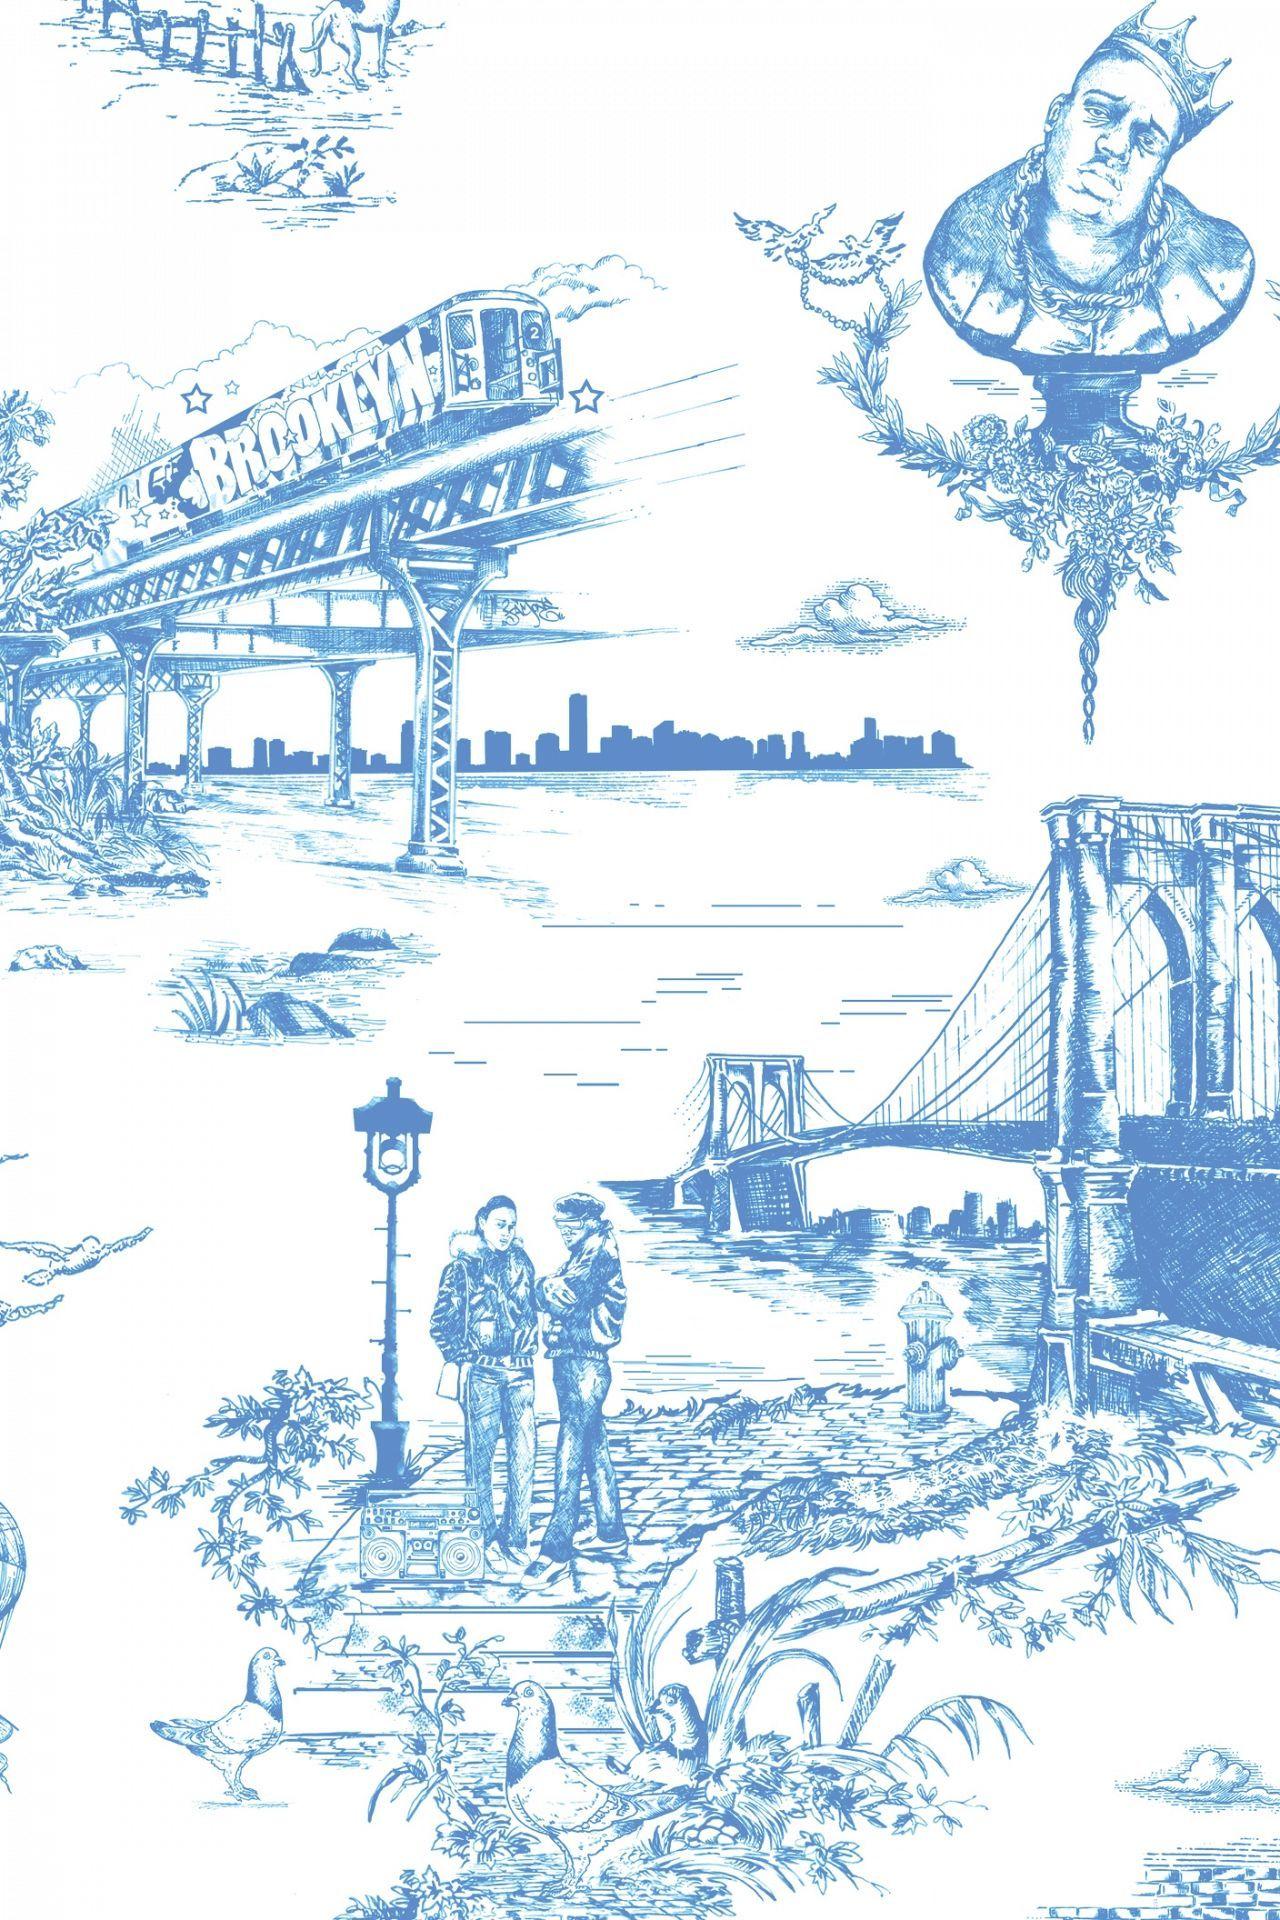 Brooklyn Toile Toile wallpaper, Carroll gardens brooklyn